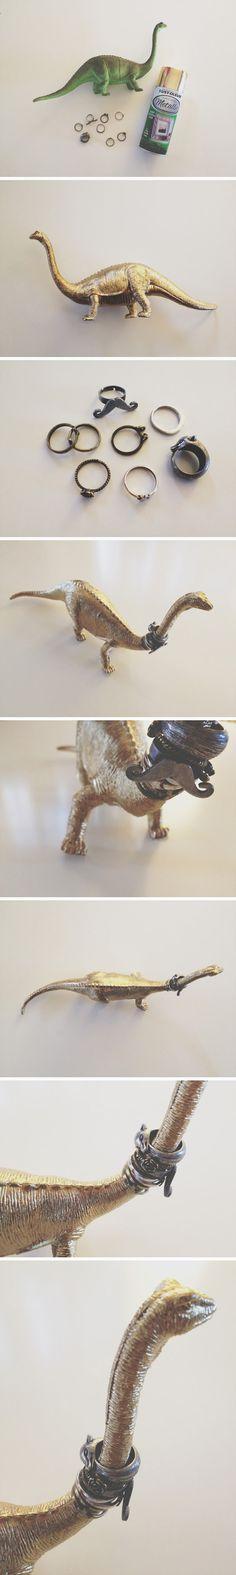 DIY Dino Ring Holder by walkinlove #DIY #Ring_Holder